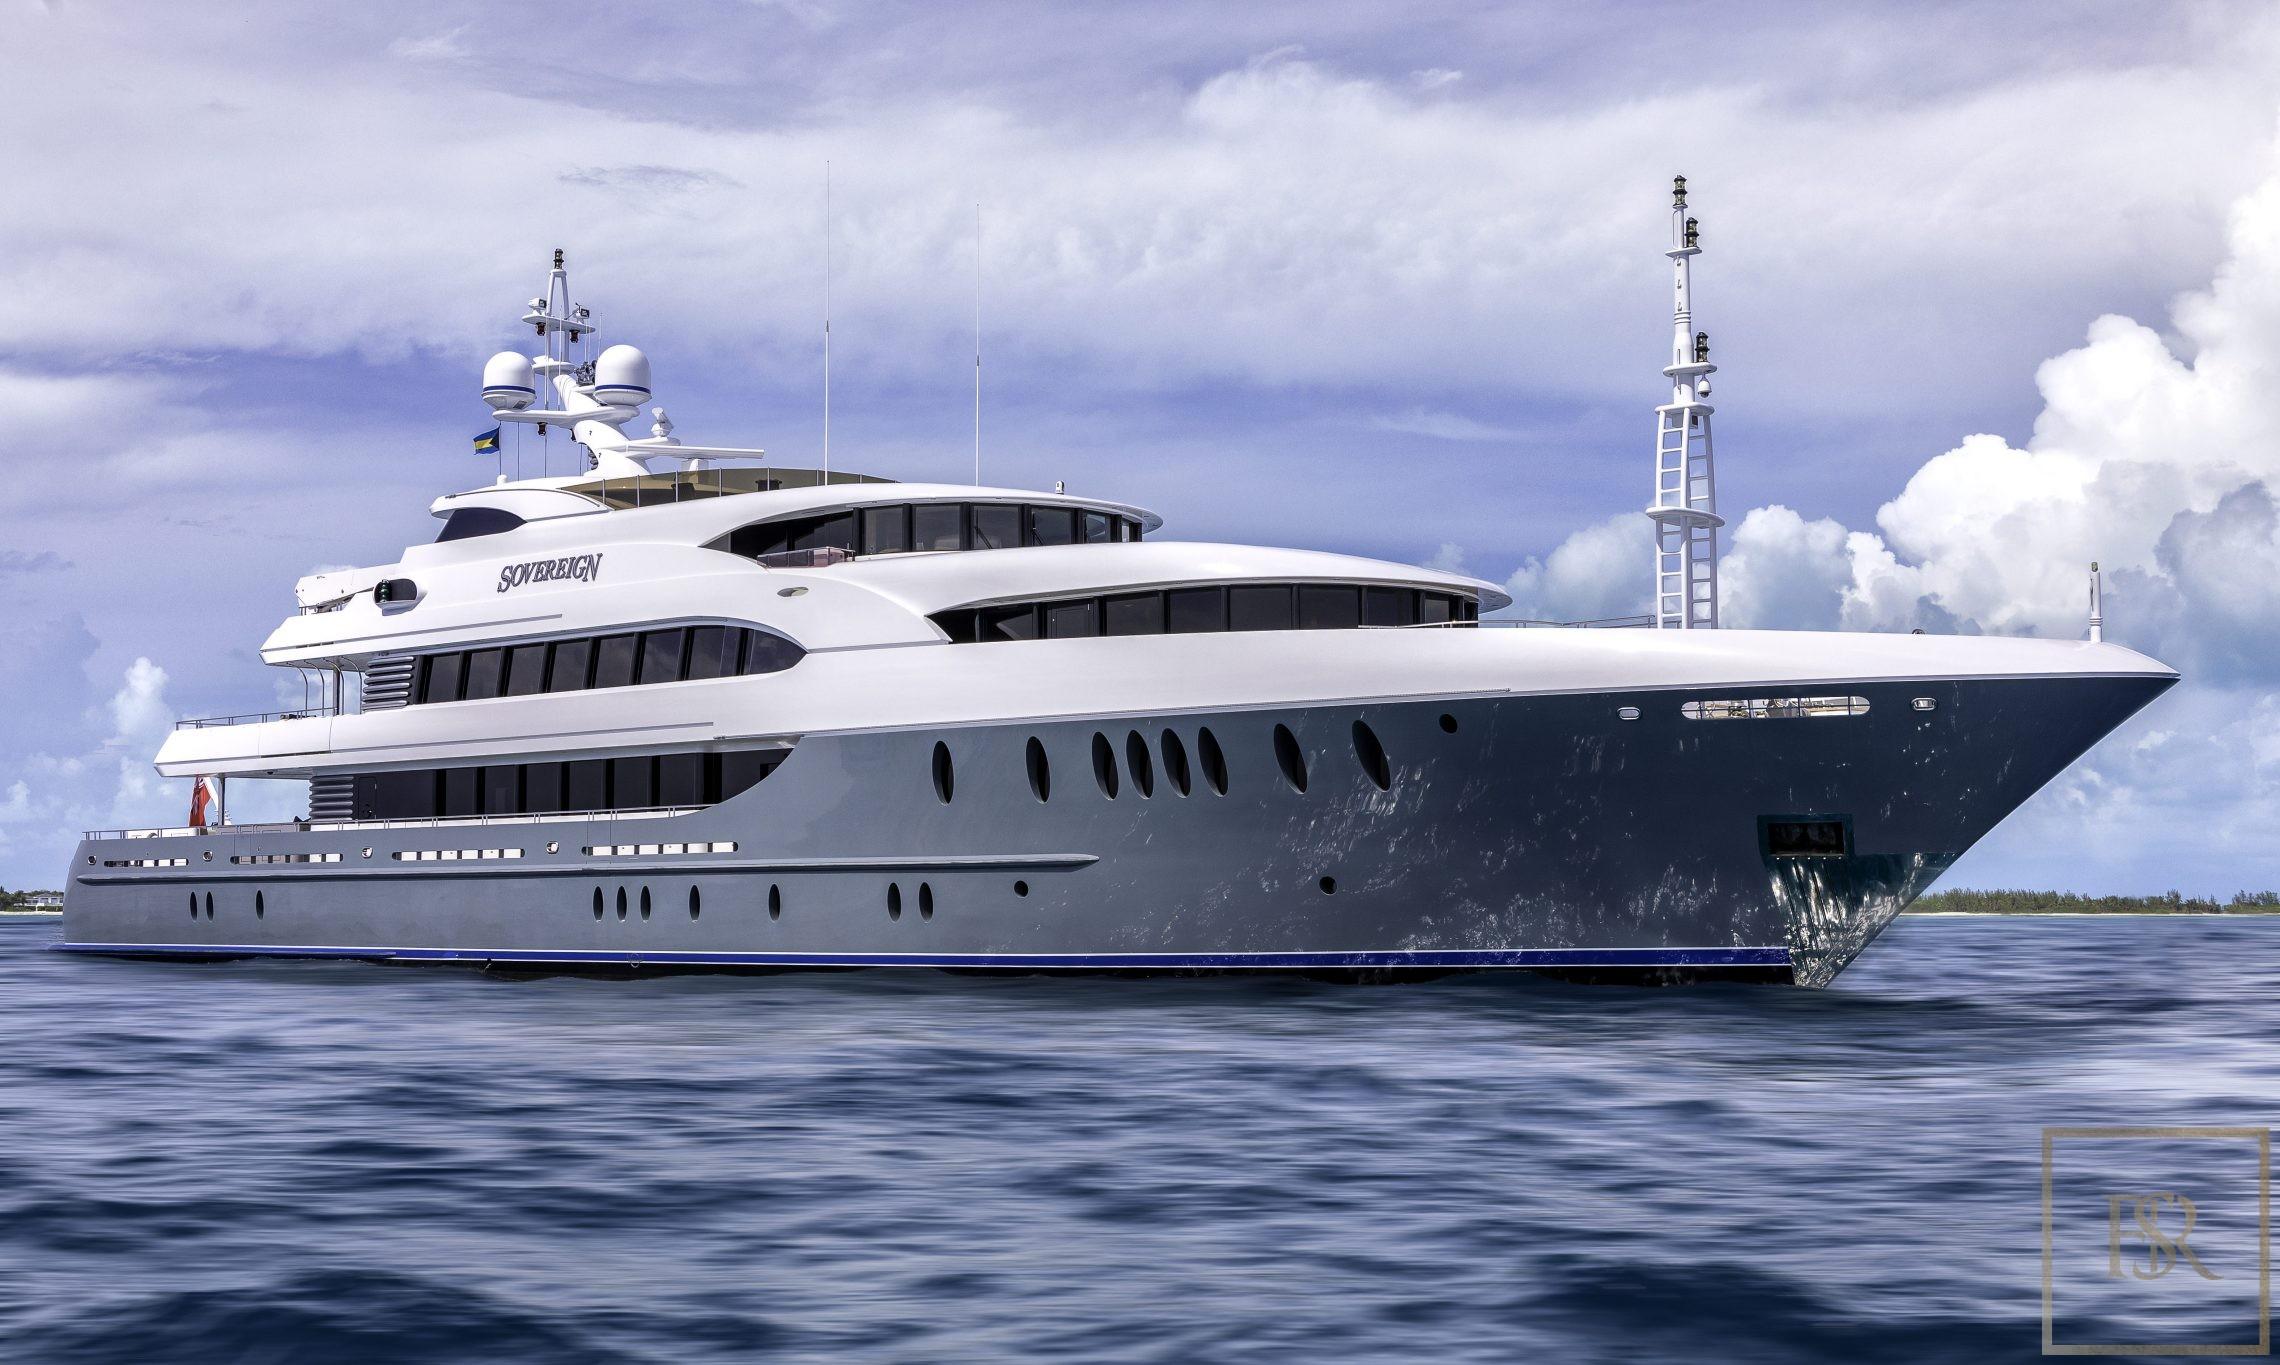 Ultra luxury Superyachts 50 meters, megayacht 80 meters, most expenvise giga yacht 100 meters super yacht for sale for super rich